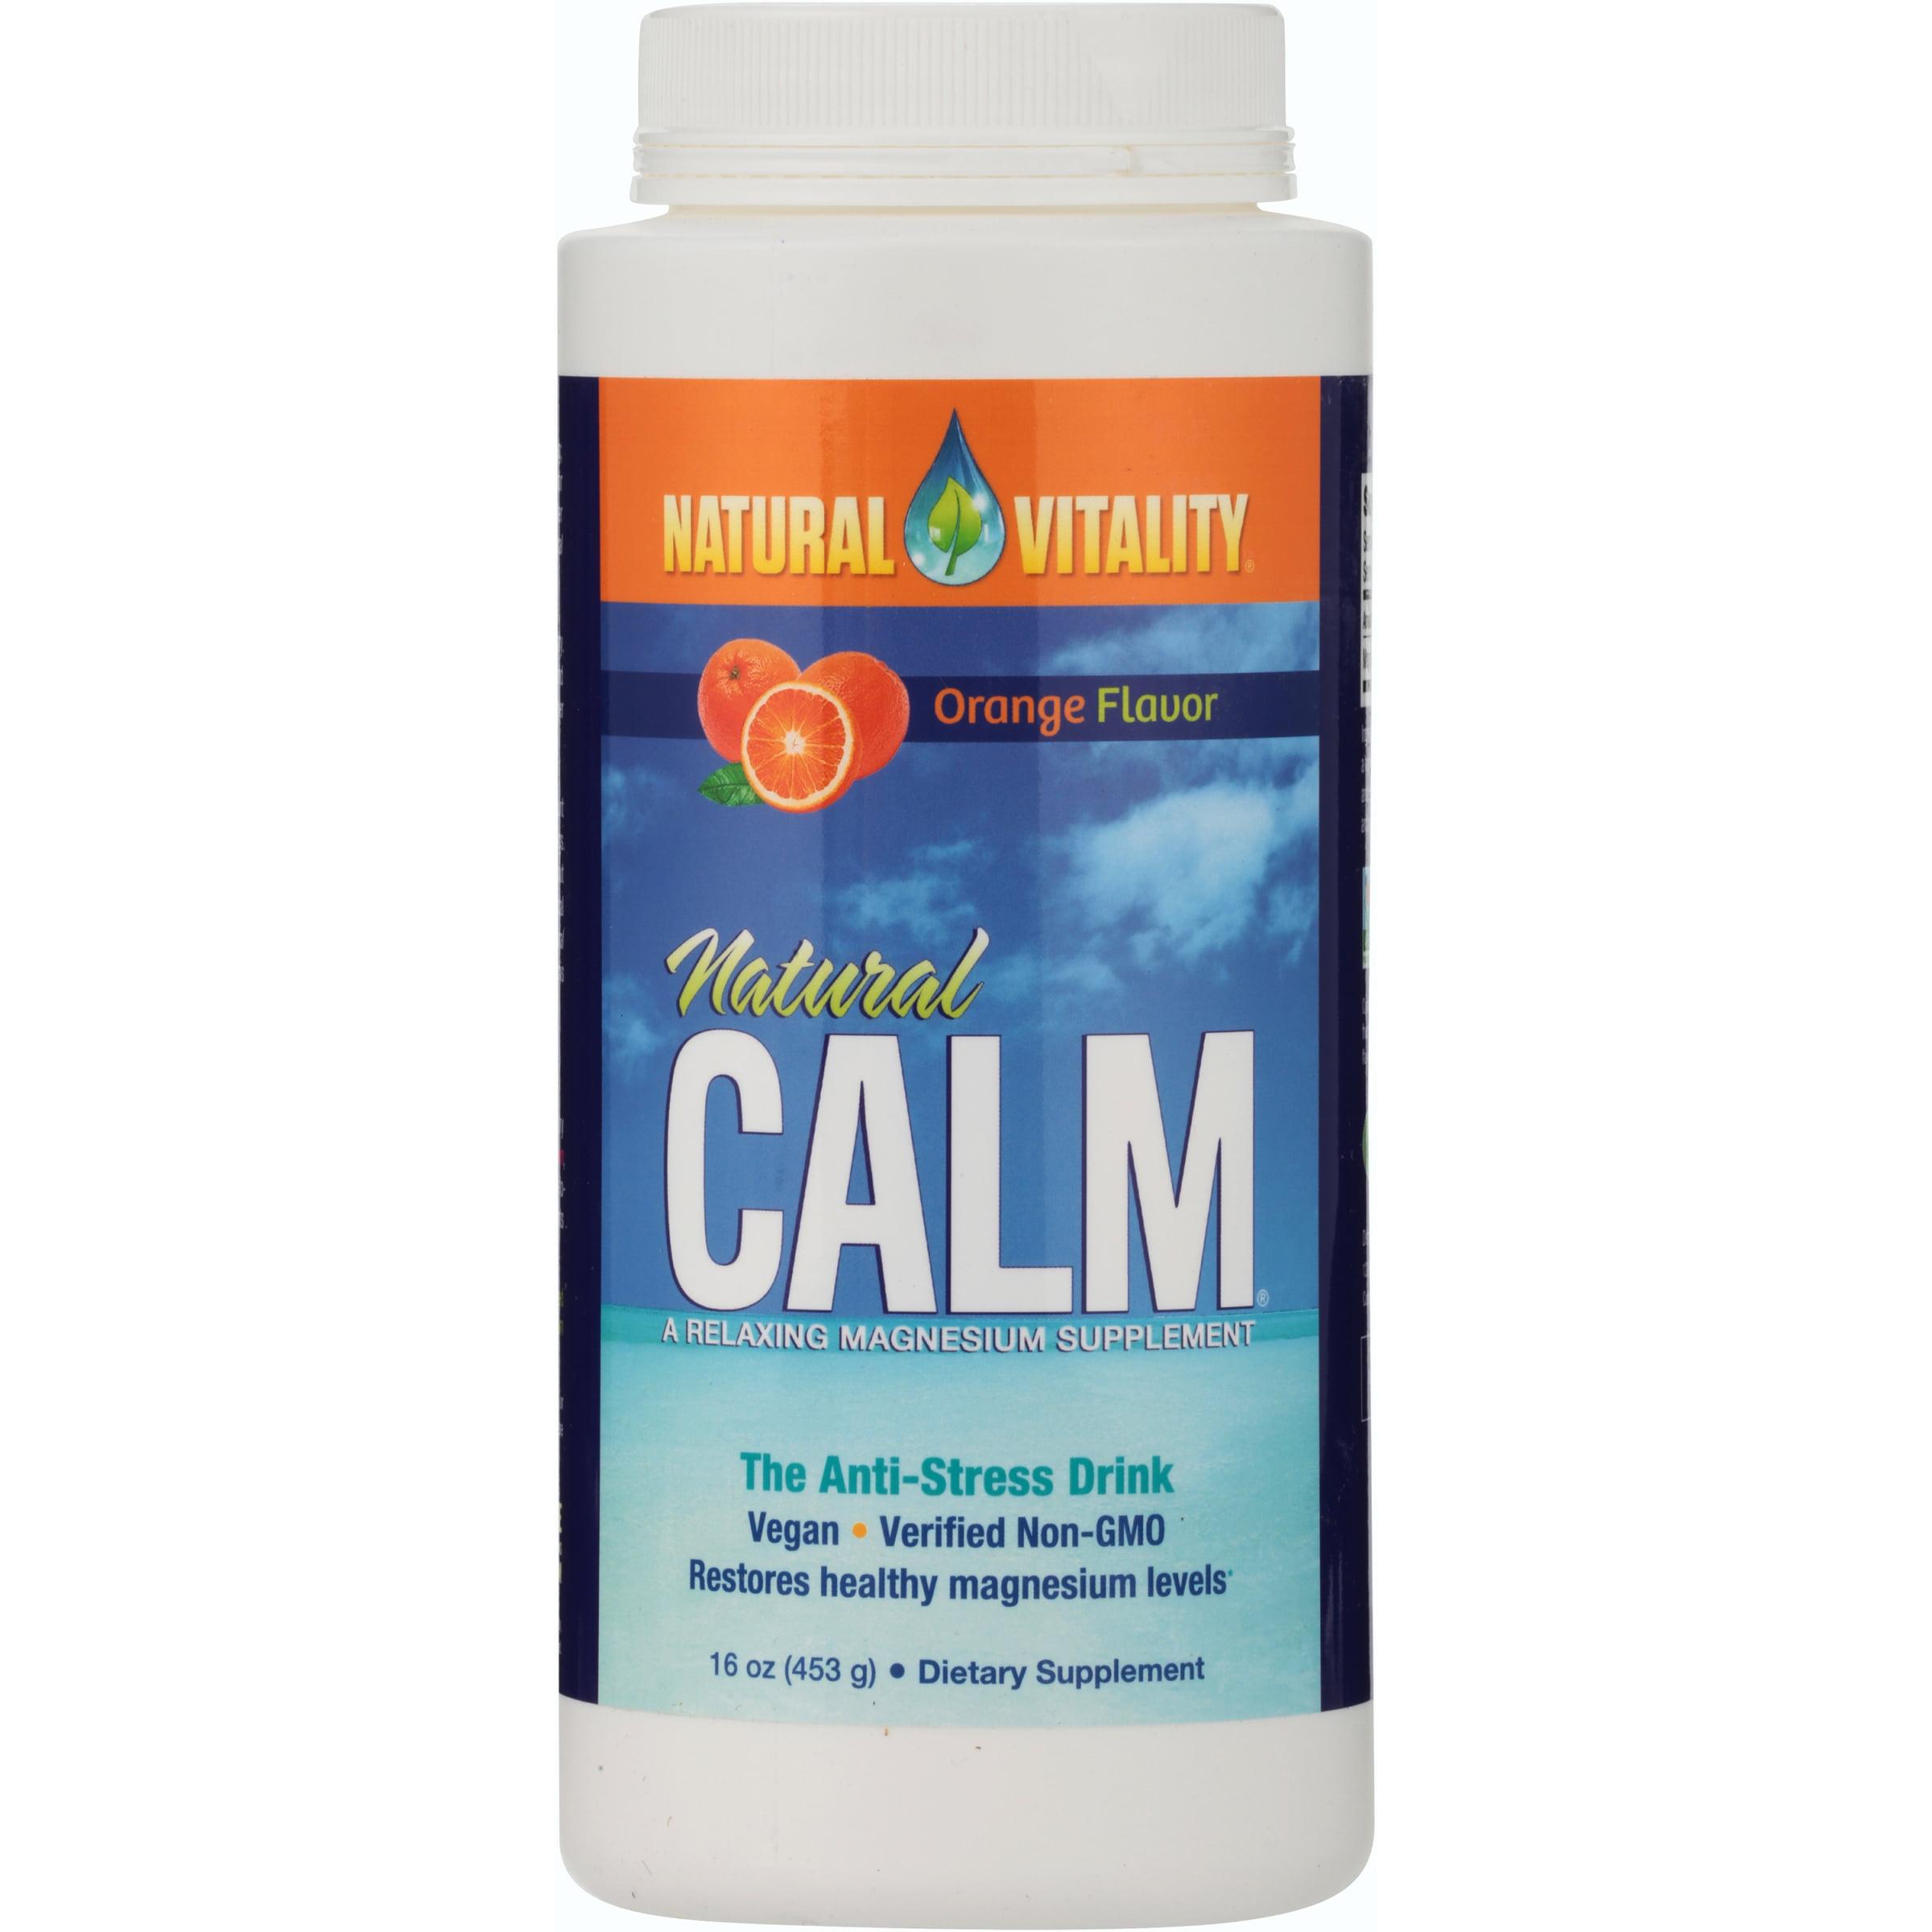 Natural Vitality Natural Calm Orange Flavor The Anti-Stress Drink, 16 oz